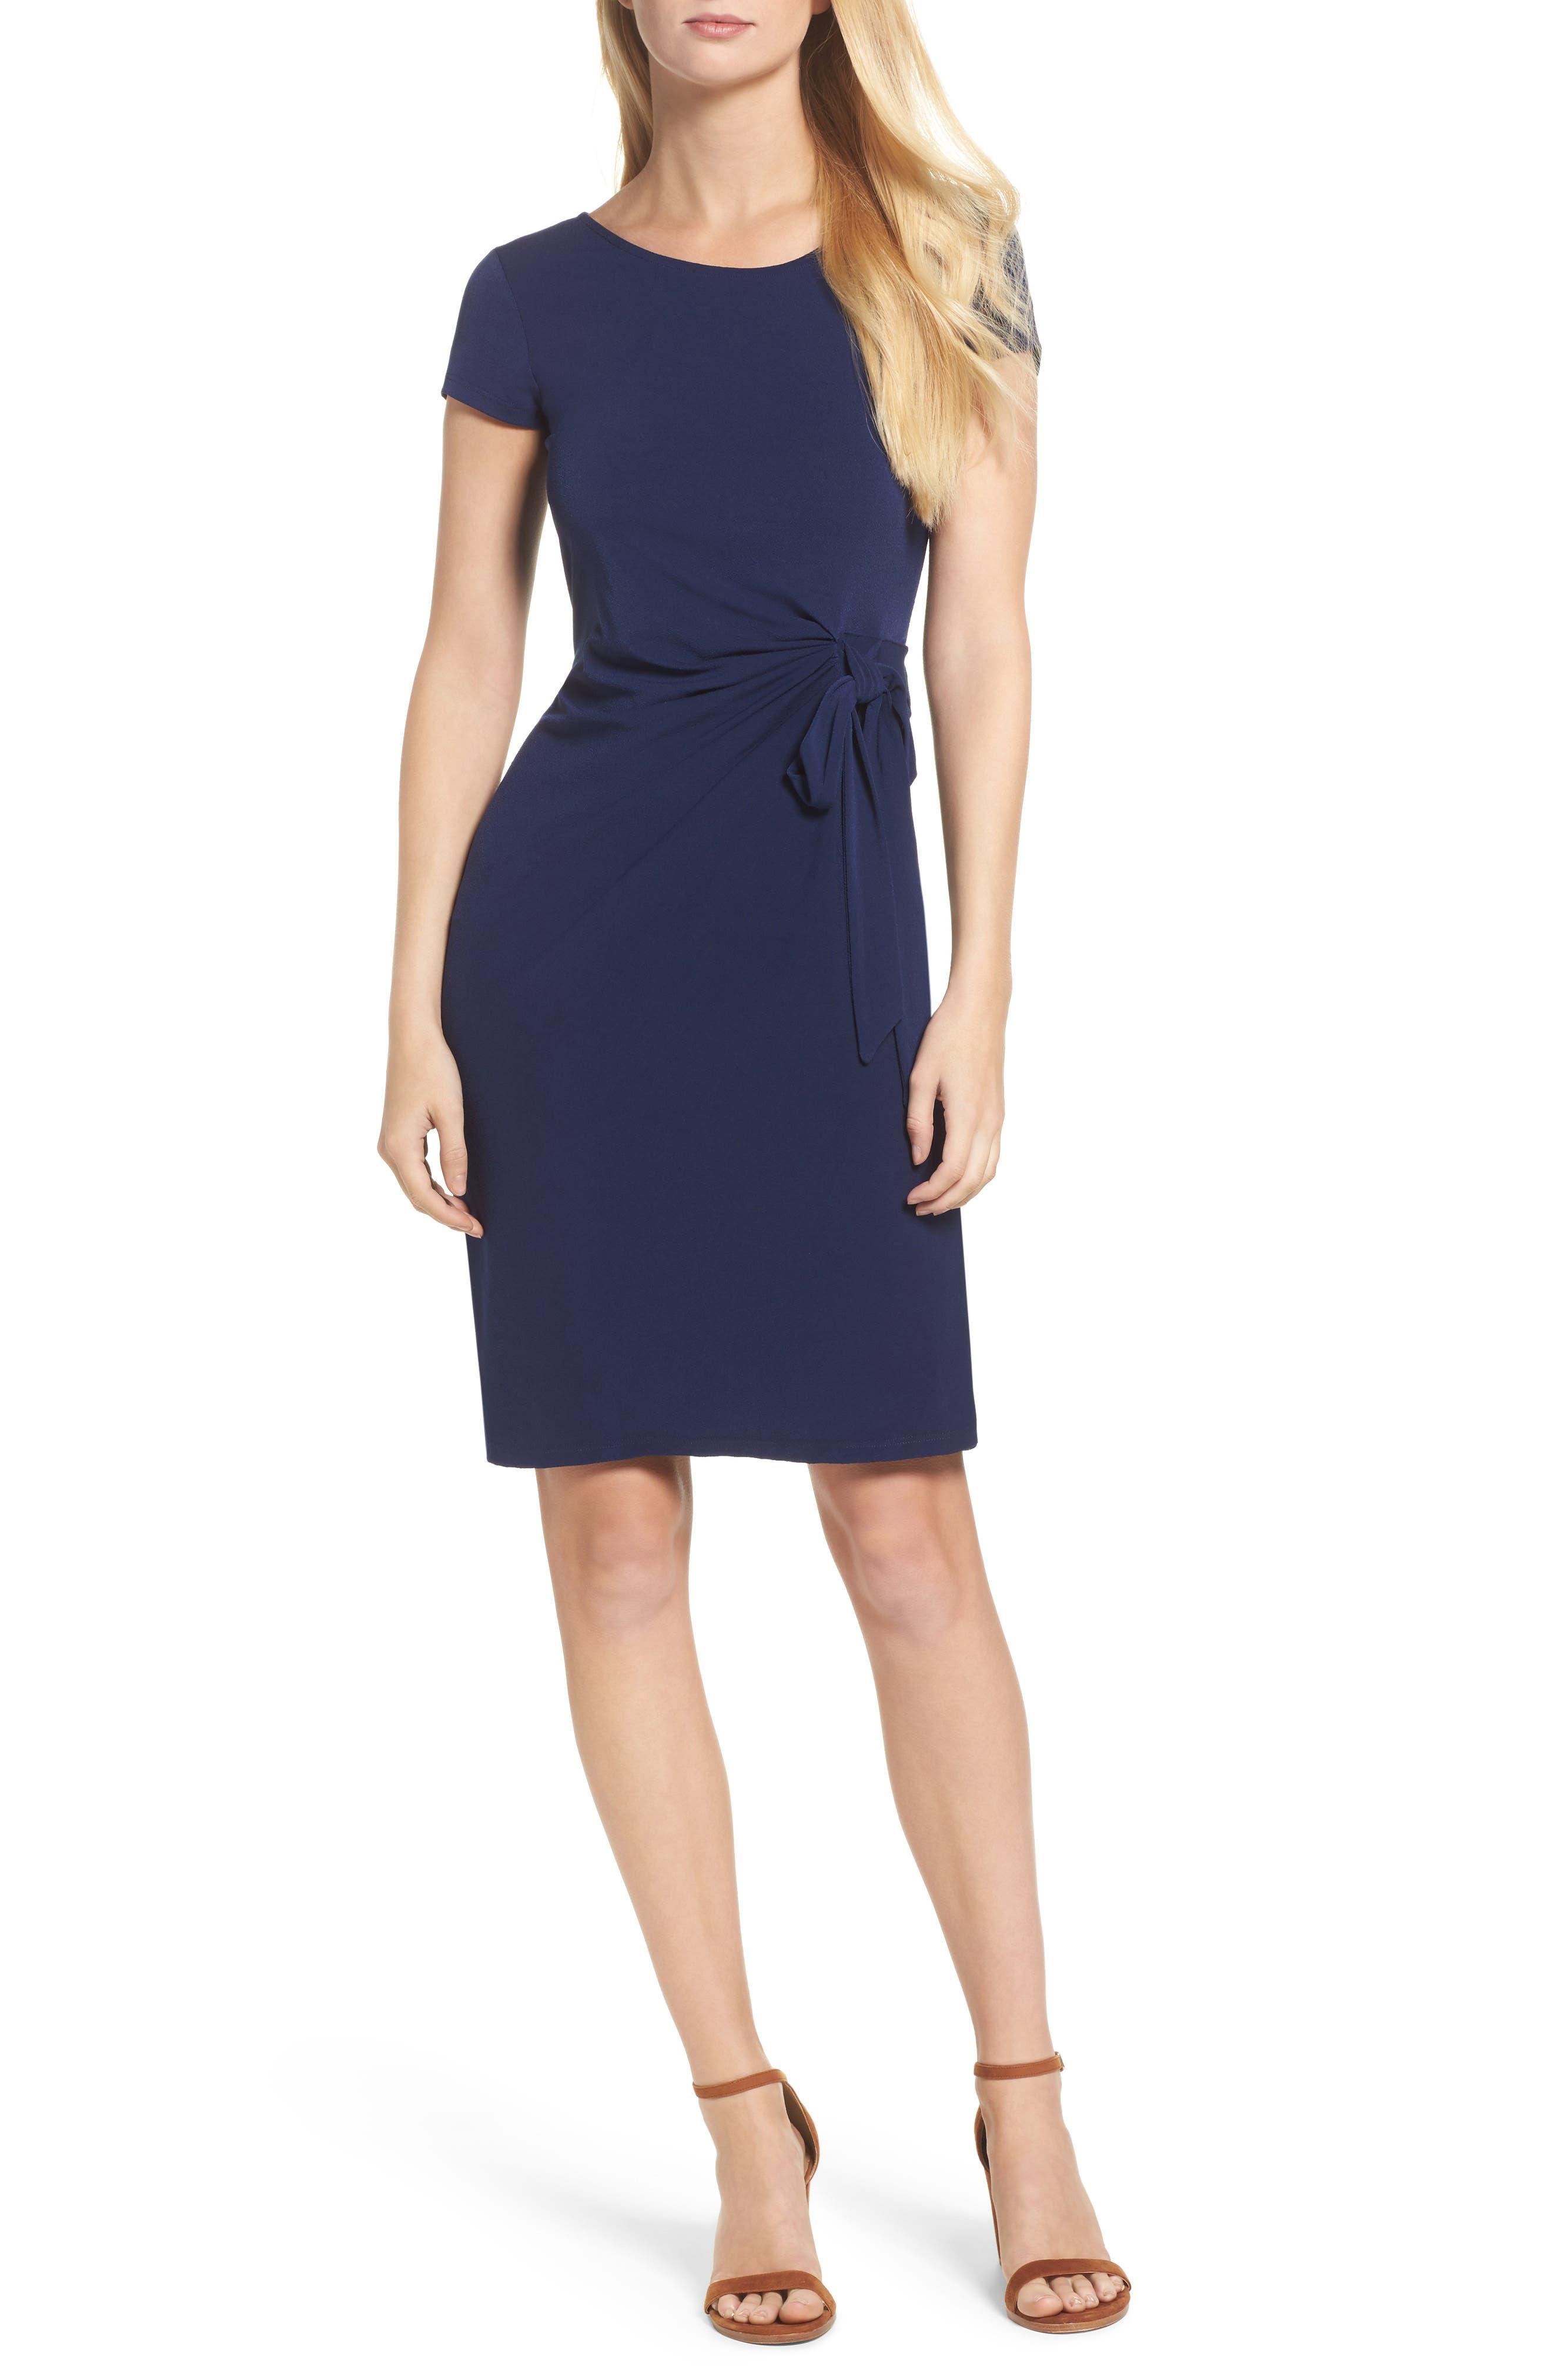 Alternate Image 1 Selected - Leota Madison Stretch Sheath Dress